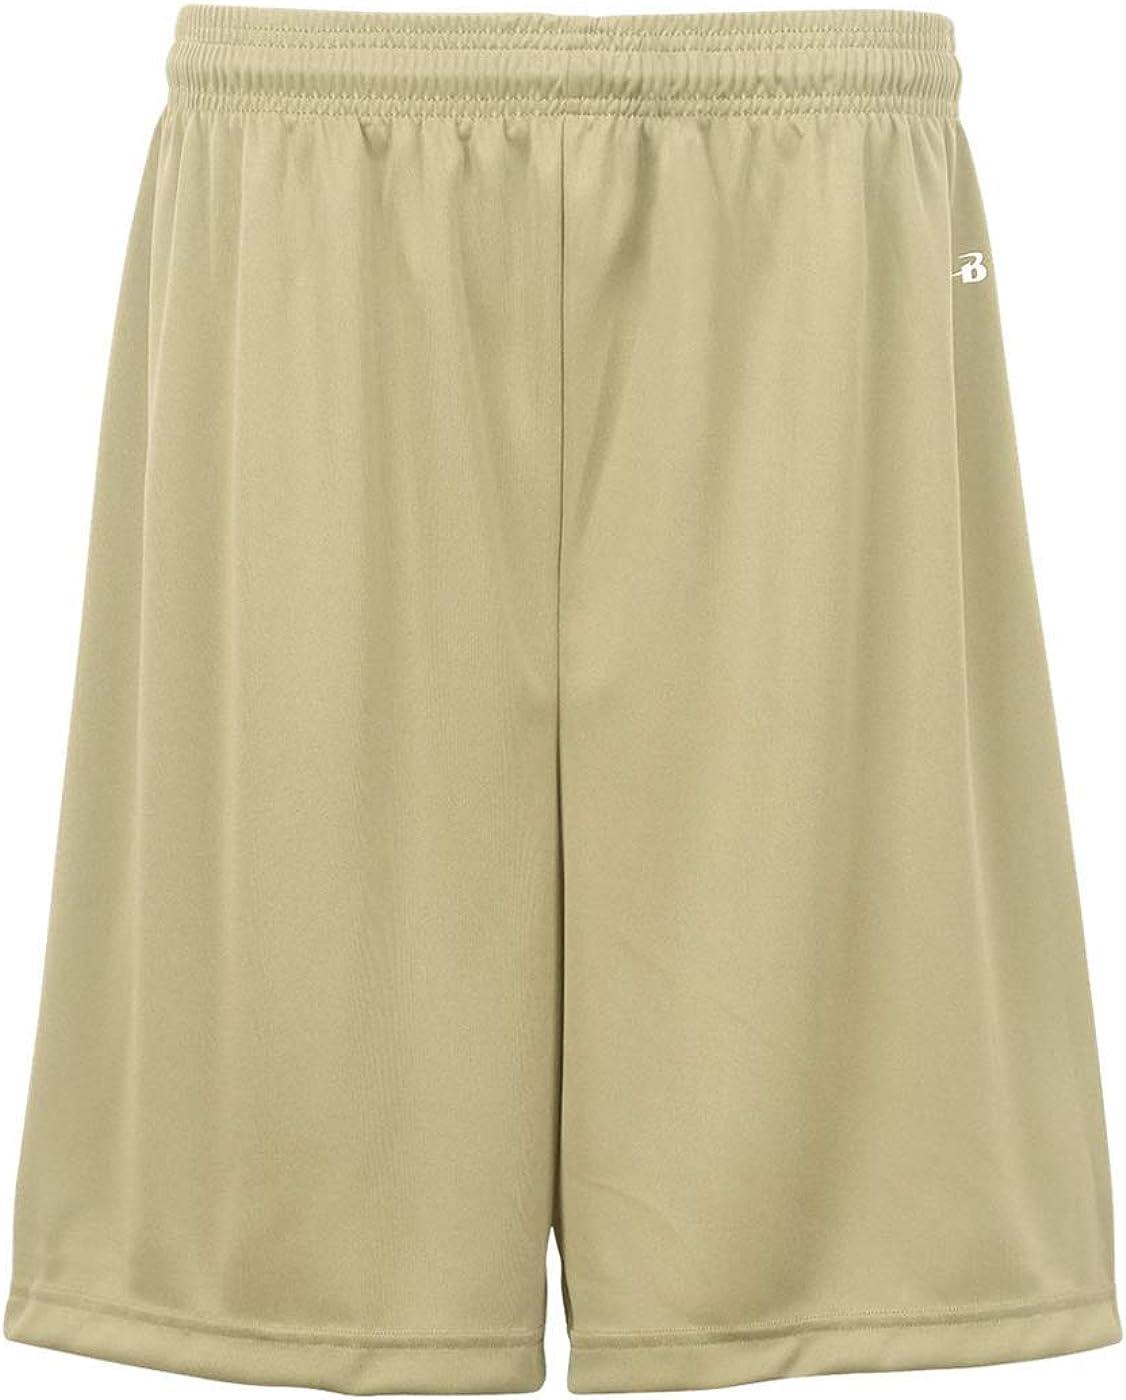 Vegas Gold Youth Large (Blank) Athletic Wicking Sports Shorts